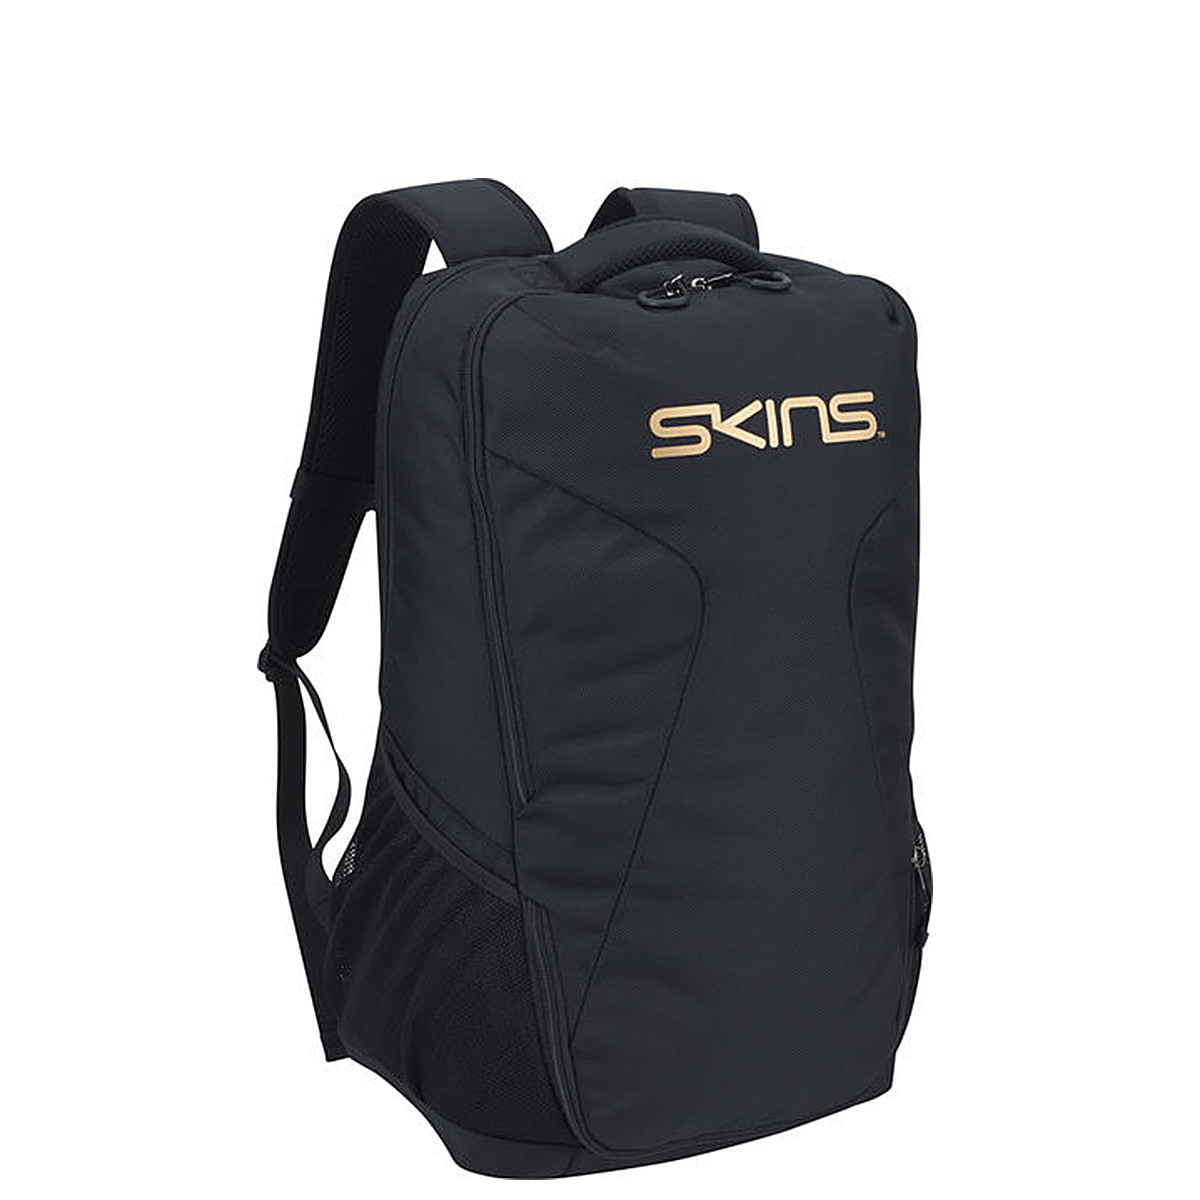 SKINS 2 ROOM BACKPACK スキンズ リュック バックパック 2ルーム 29L メンズ レディース ブラック KMALJA21 [189]